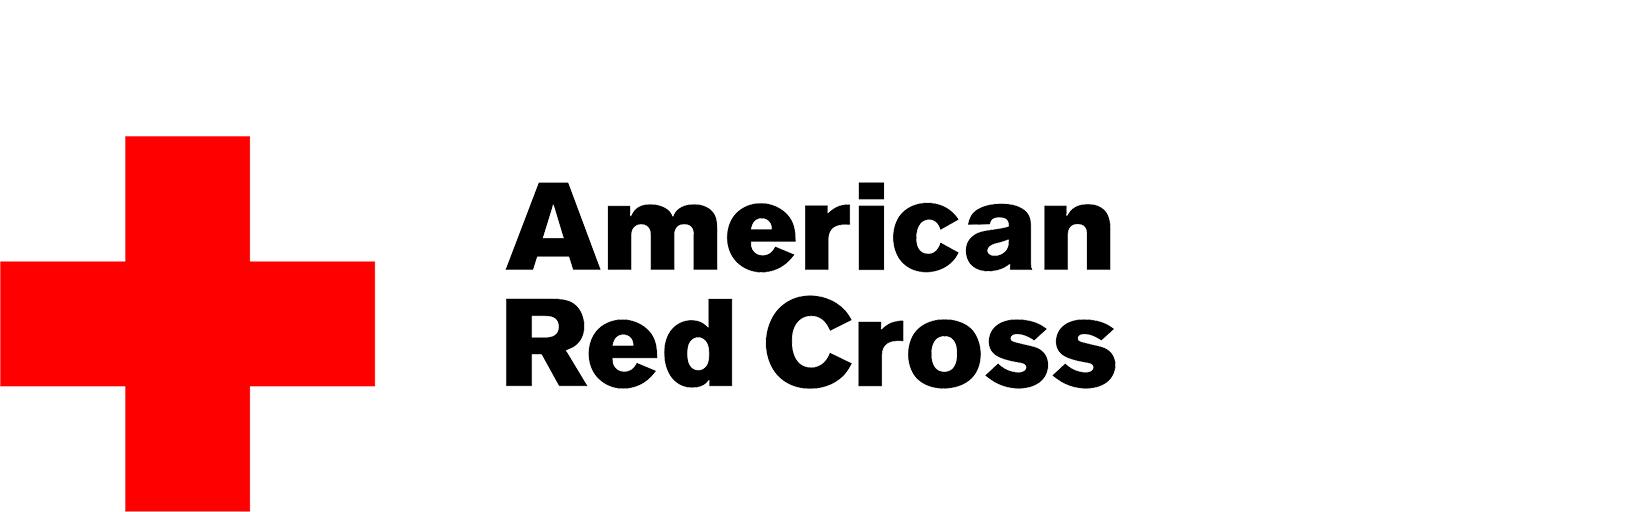 Volunteer with Red Cross